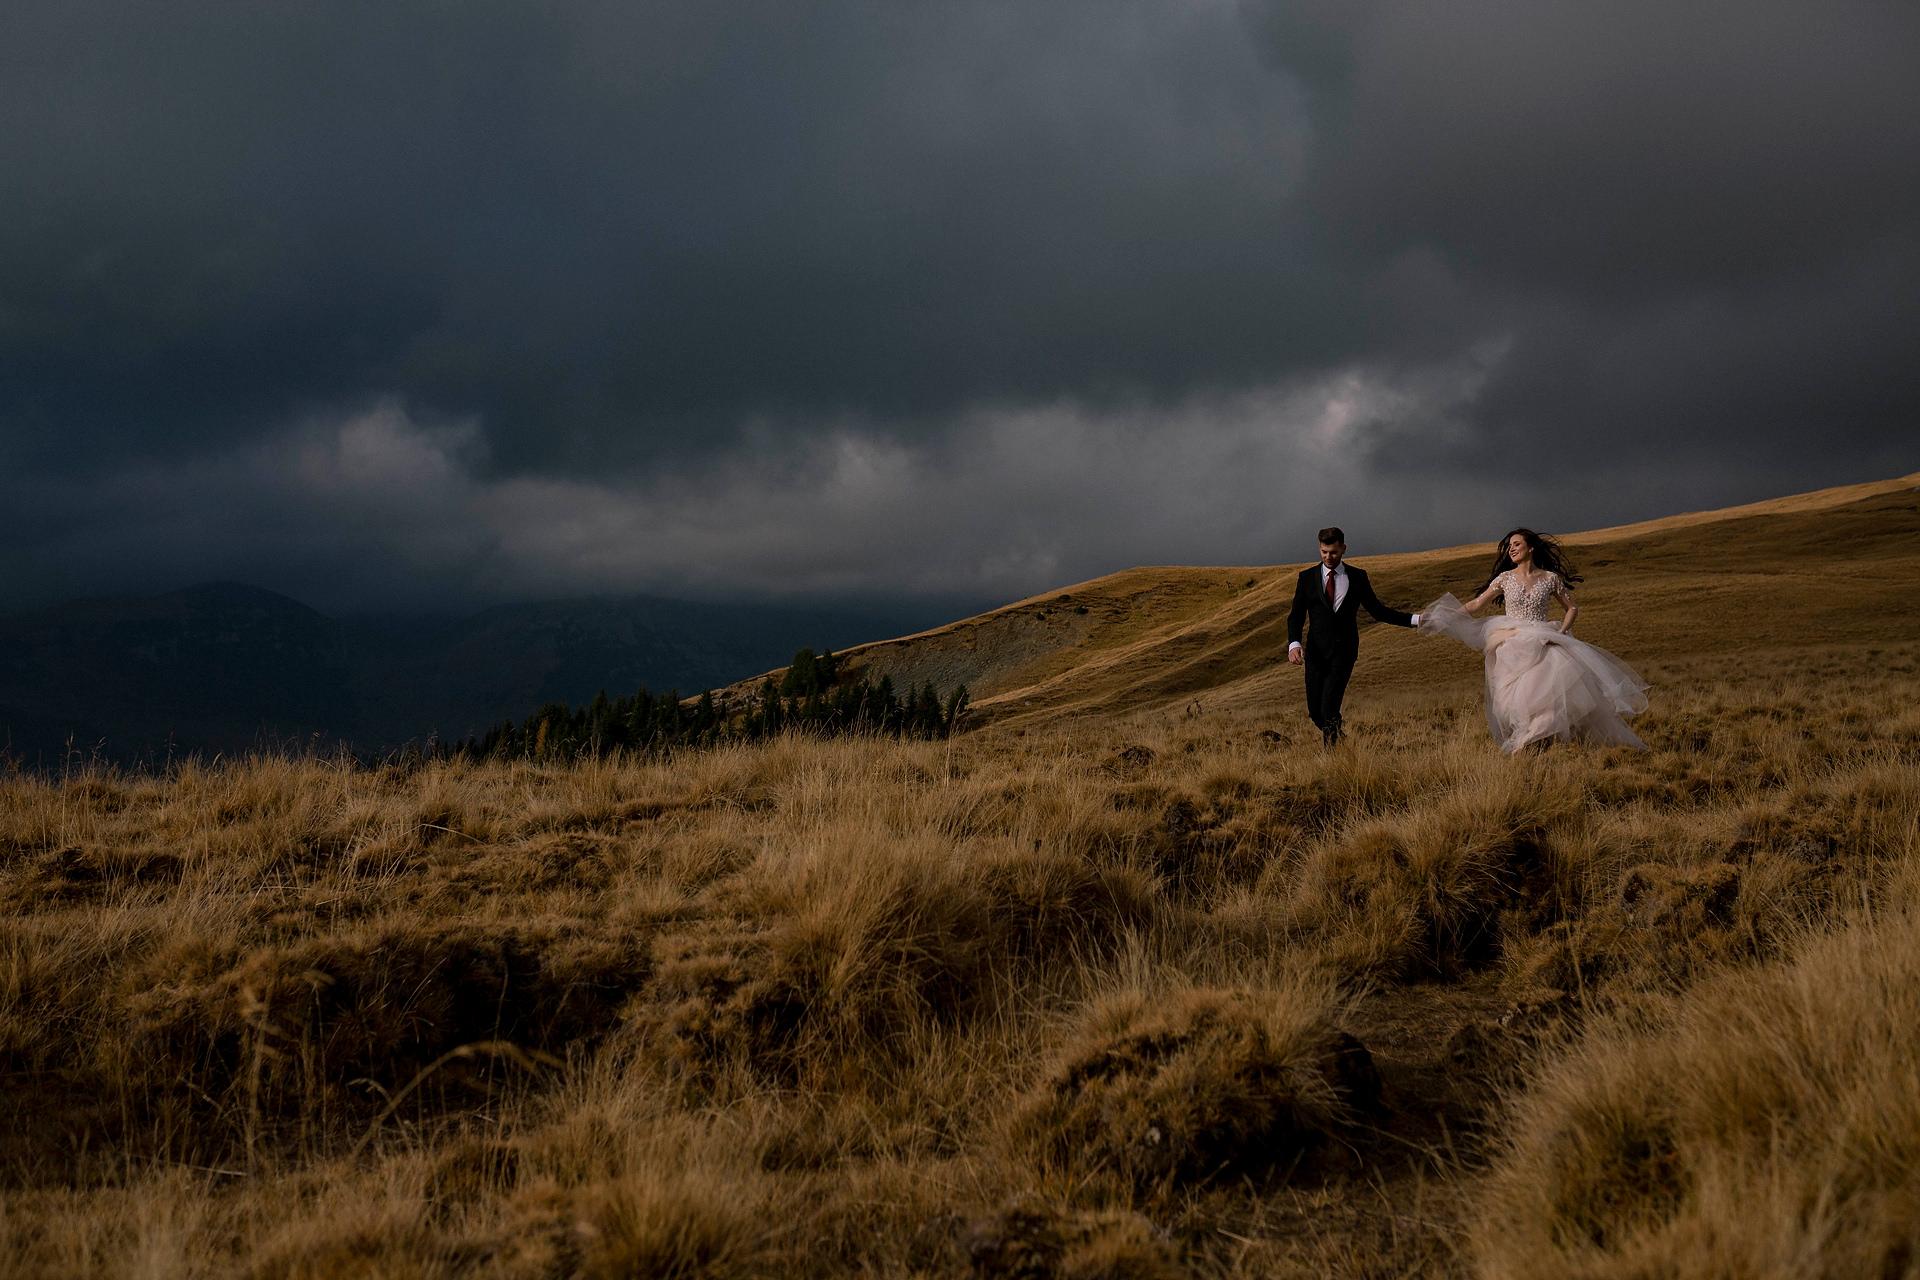 After-wedding-Bucegi-fotograf-nunta-sesivede-fotografie-004